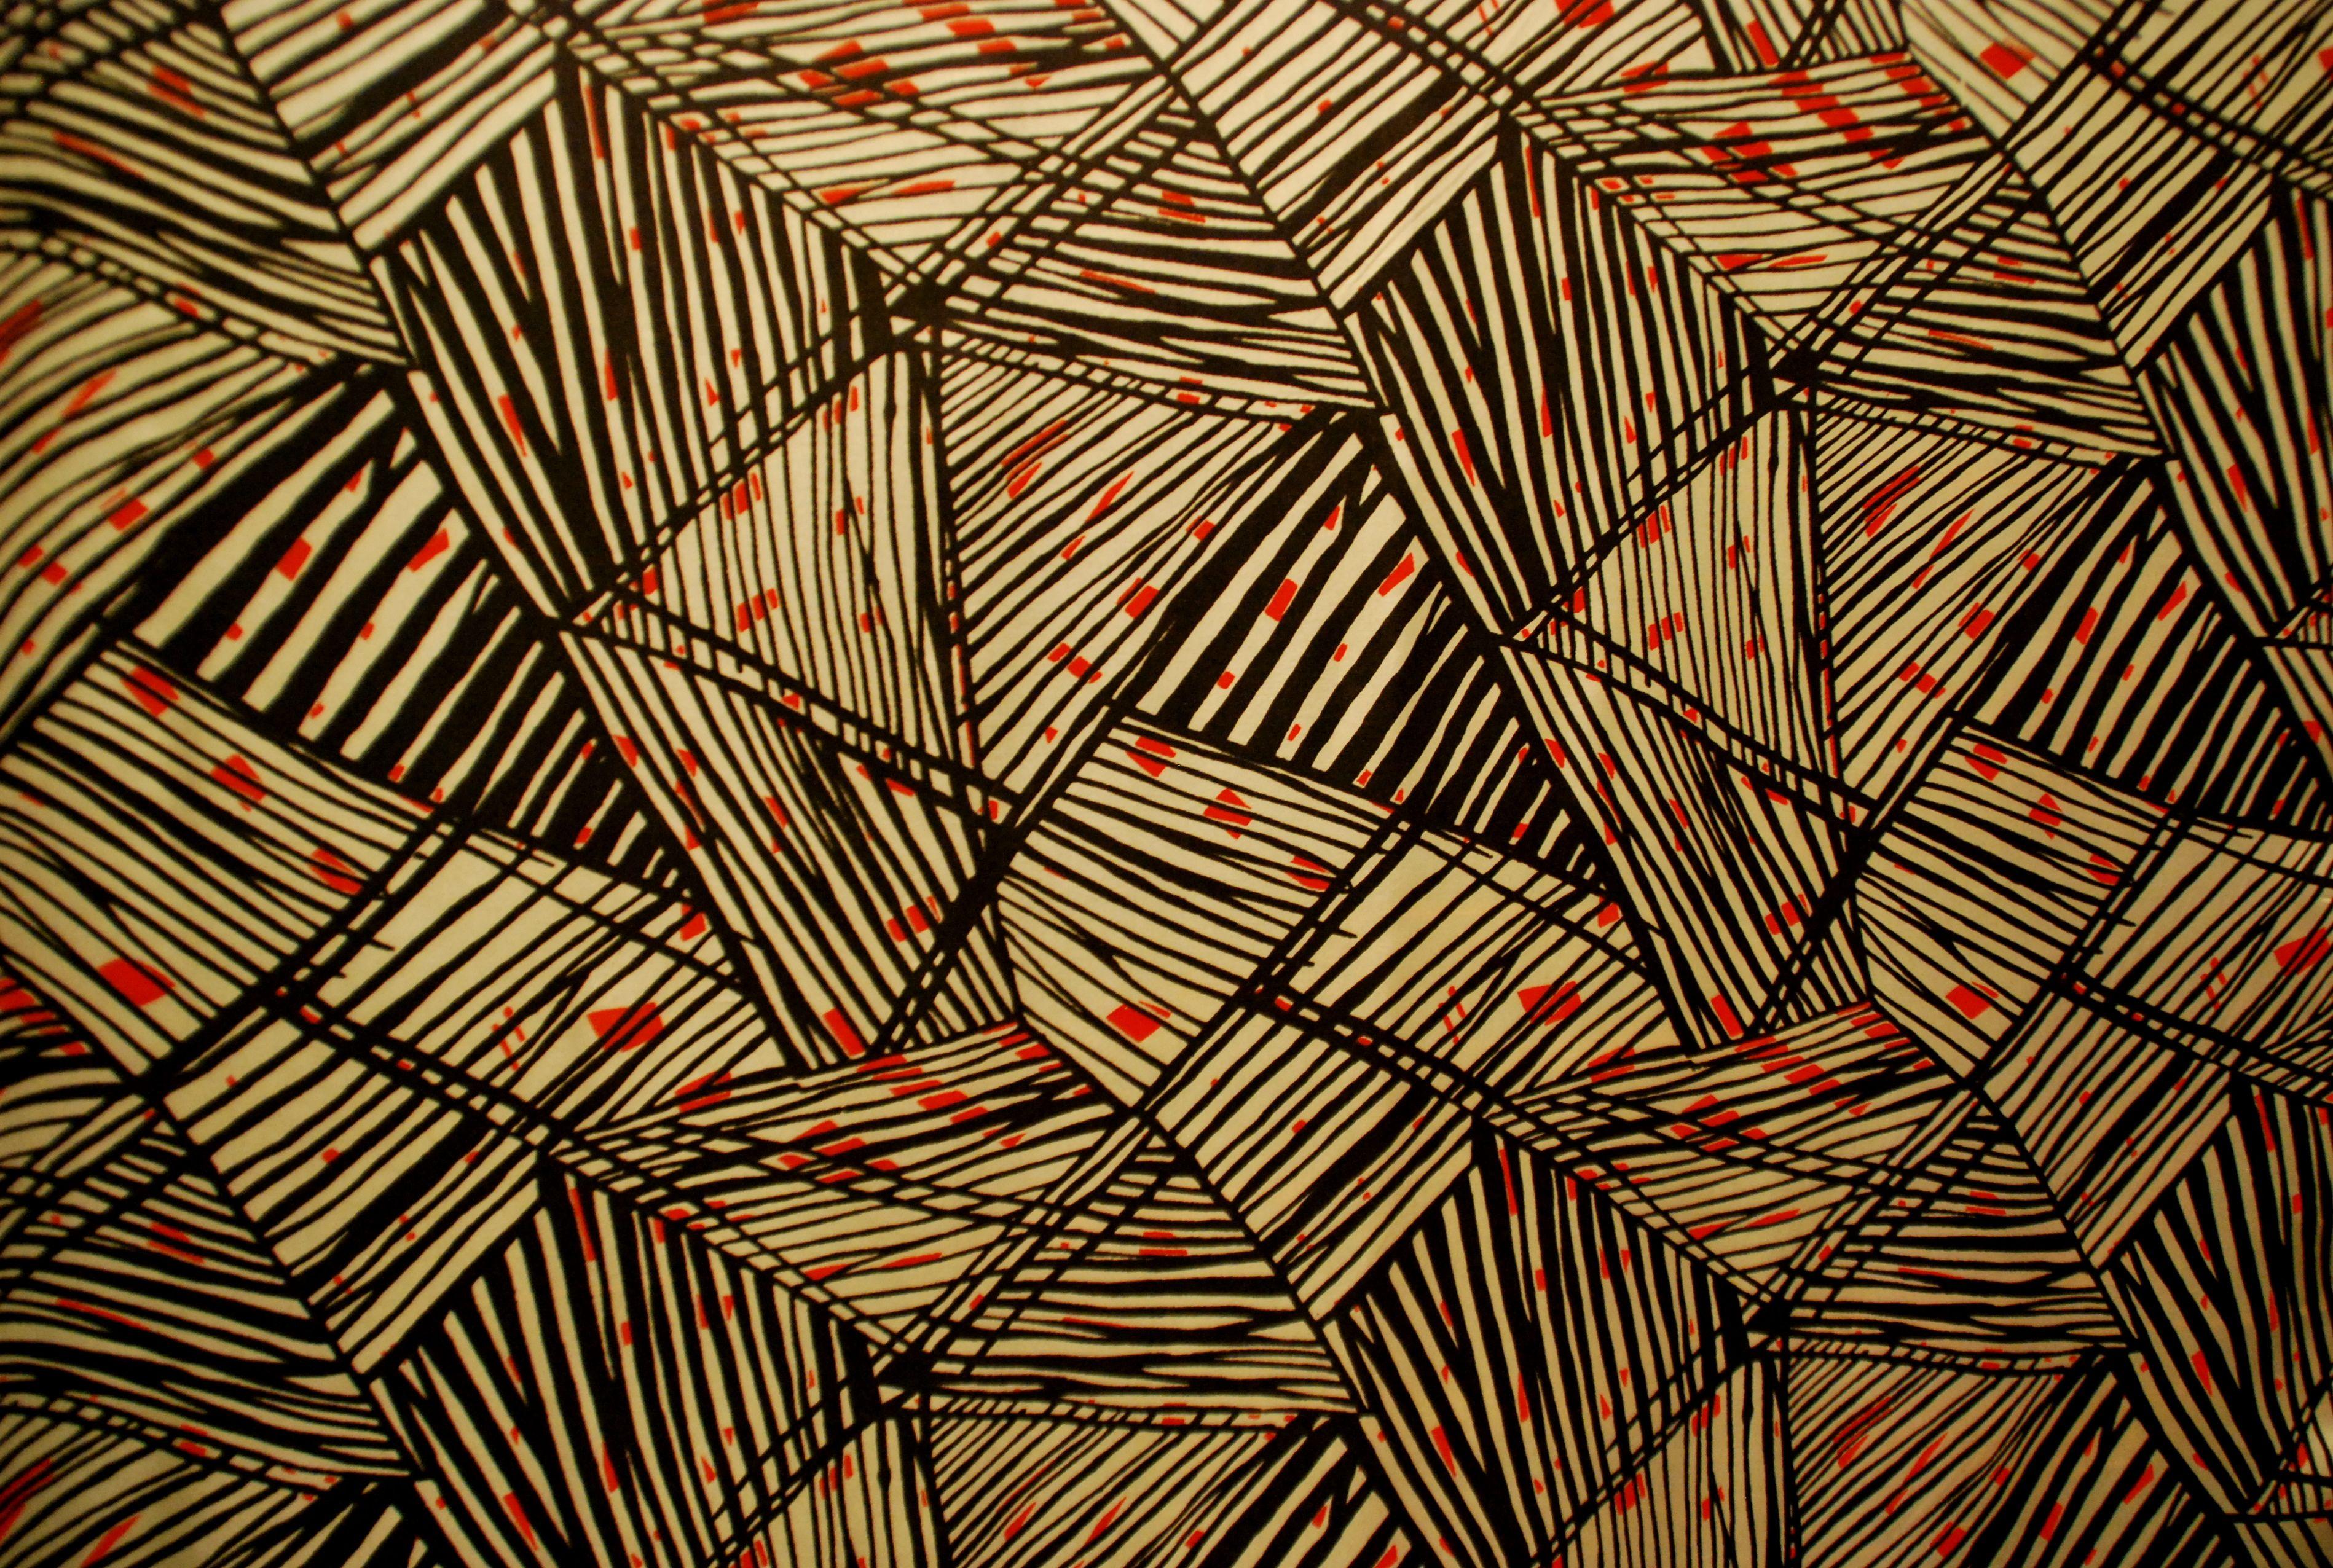 Patterns And Textures Textures And Patterns Textures Patterns Texture Free Textures